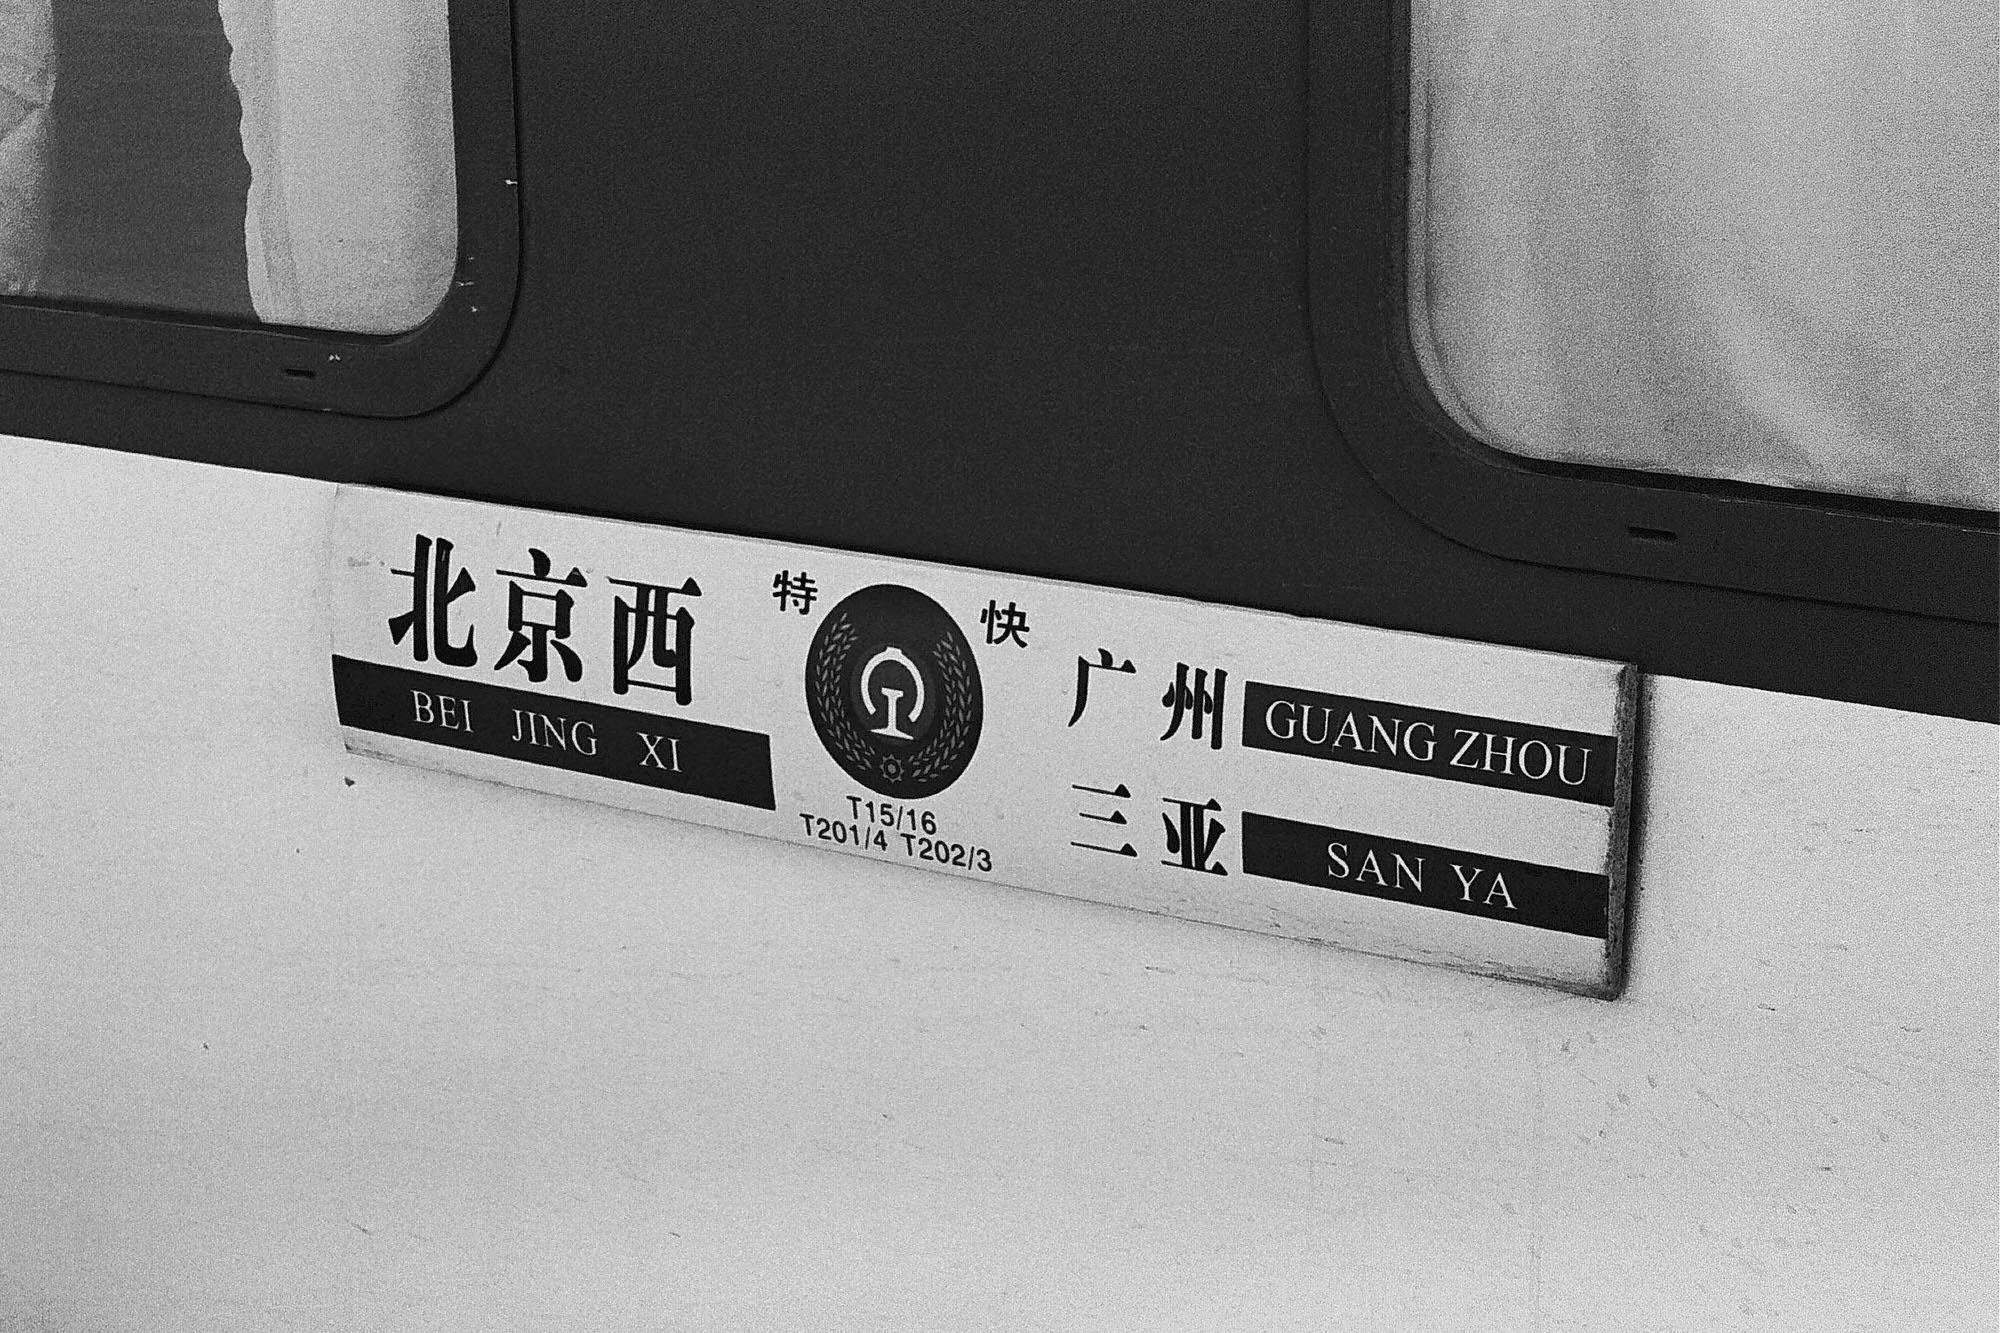 35mmPatrikWallner_Sanya_BeijingSanyaTrain_RBG_LOWQ